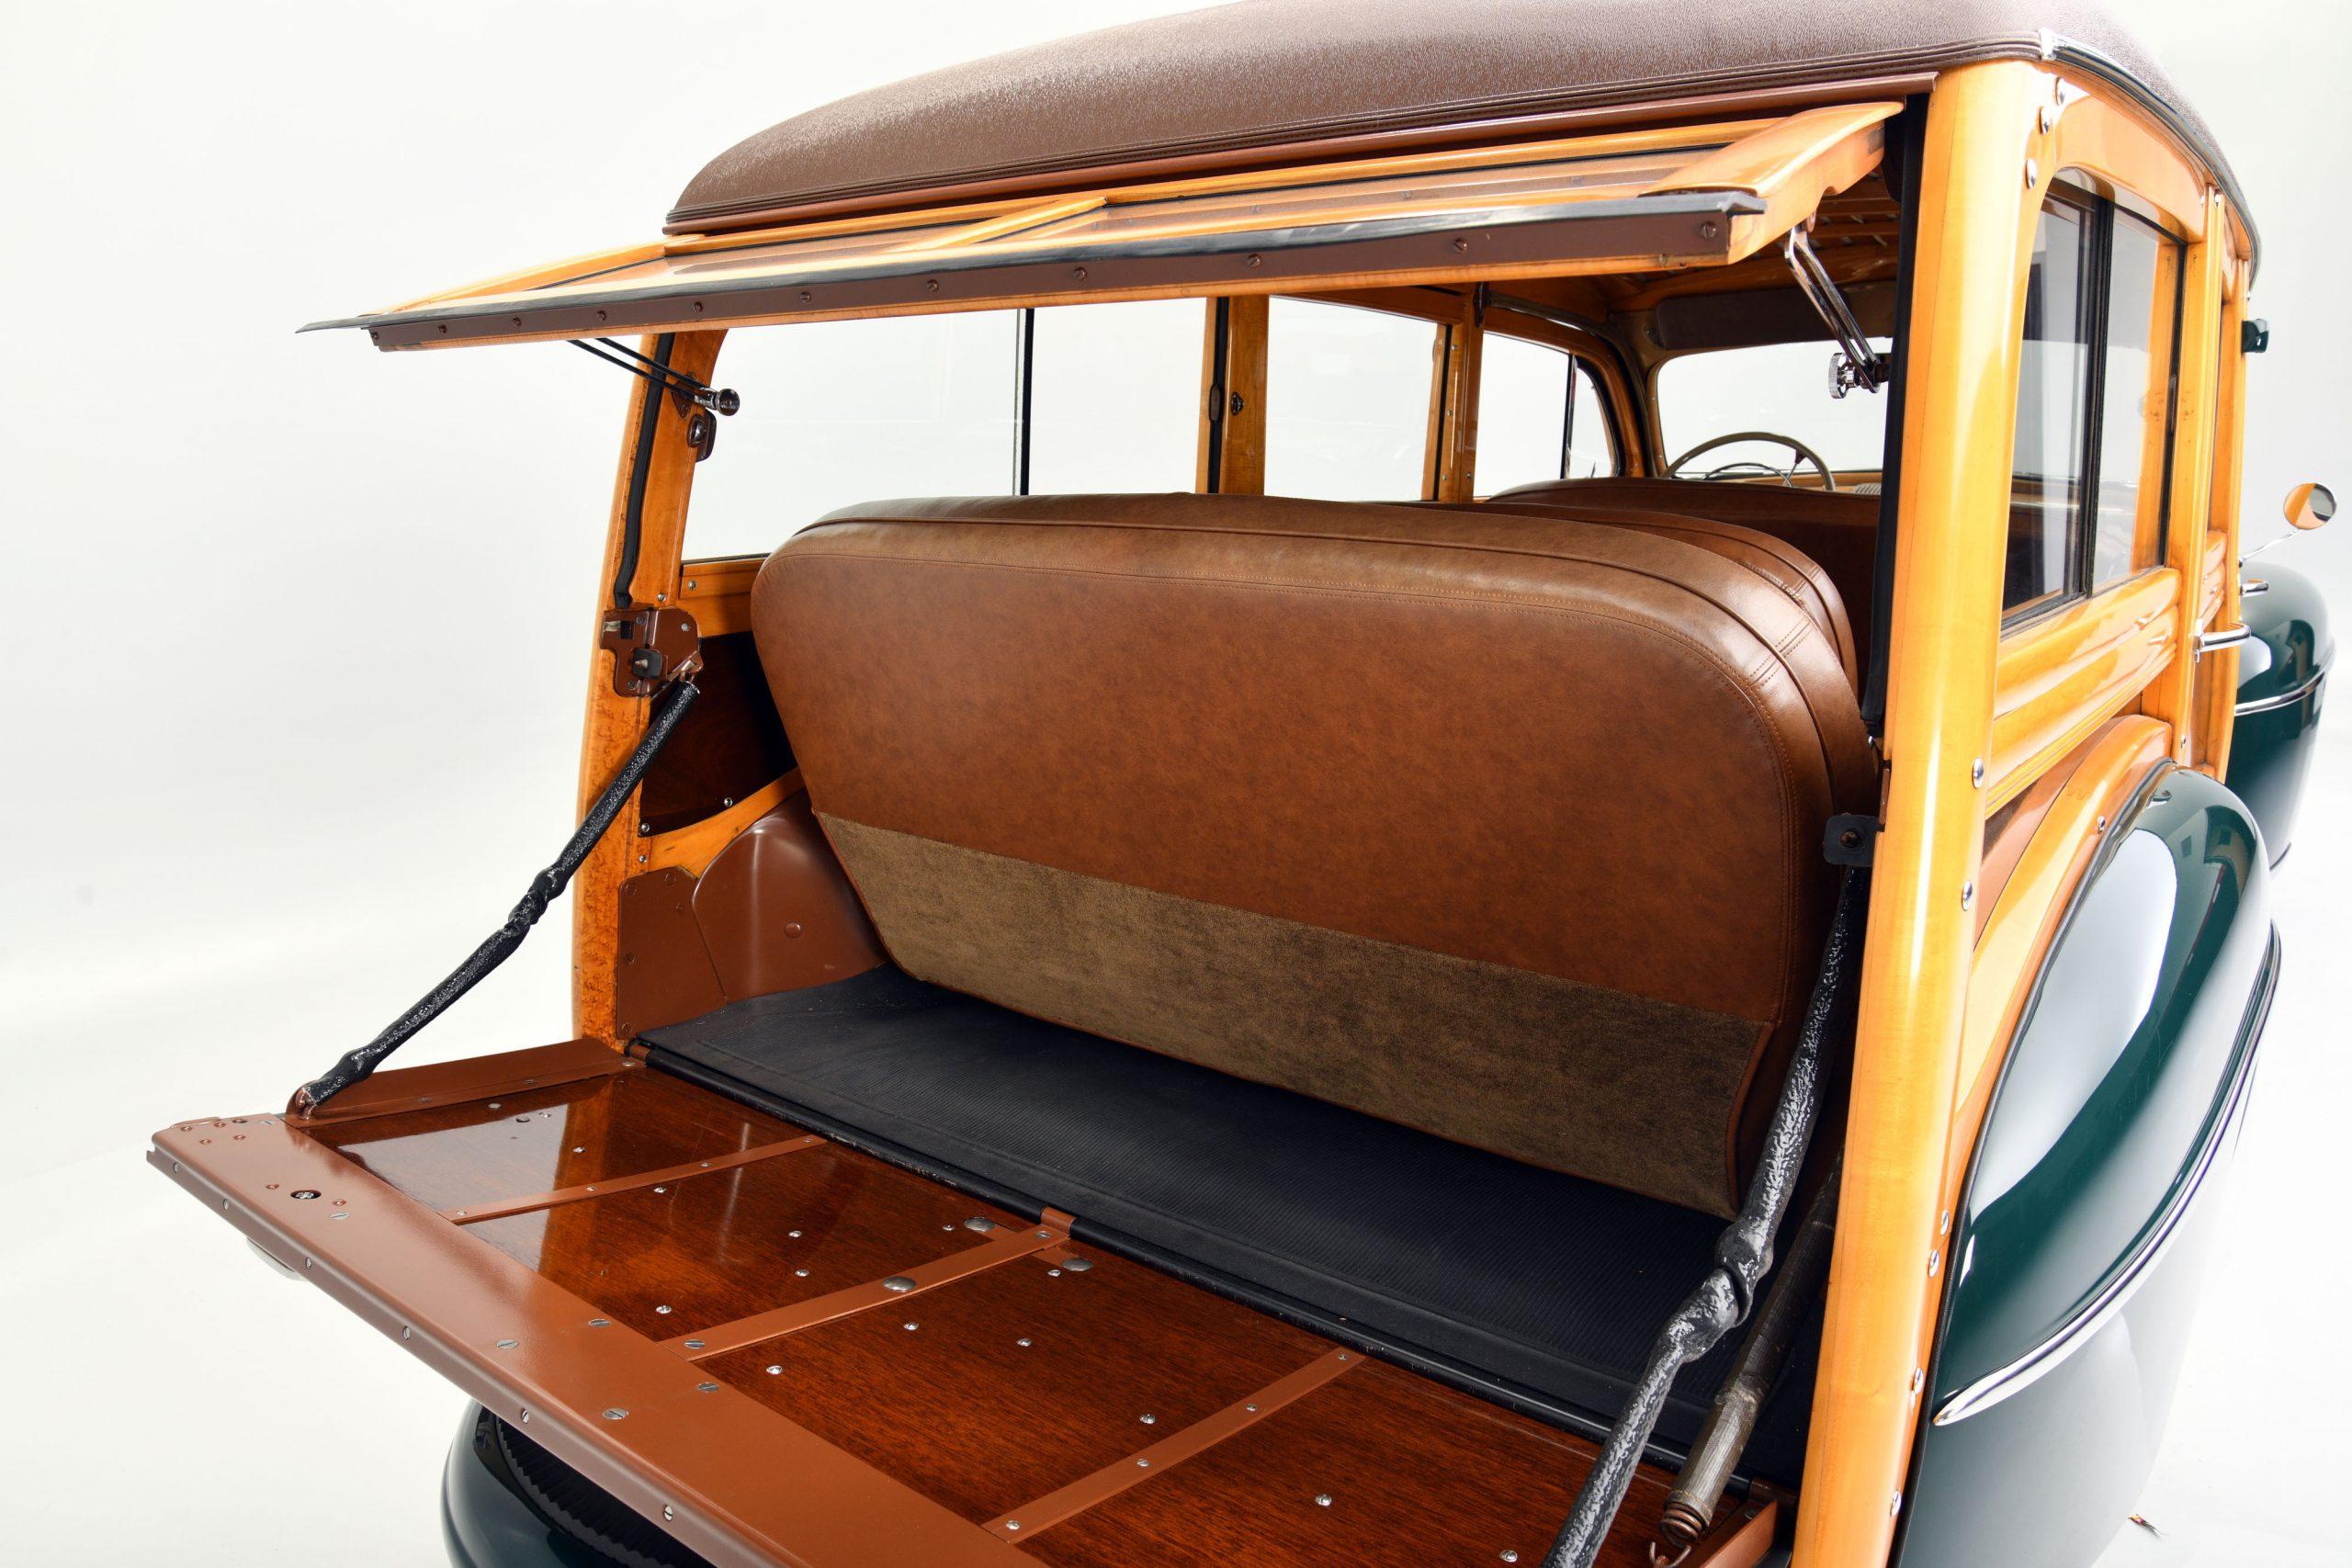 1947 FORD SUPER DELUXE CUSTOM interior rear cargo